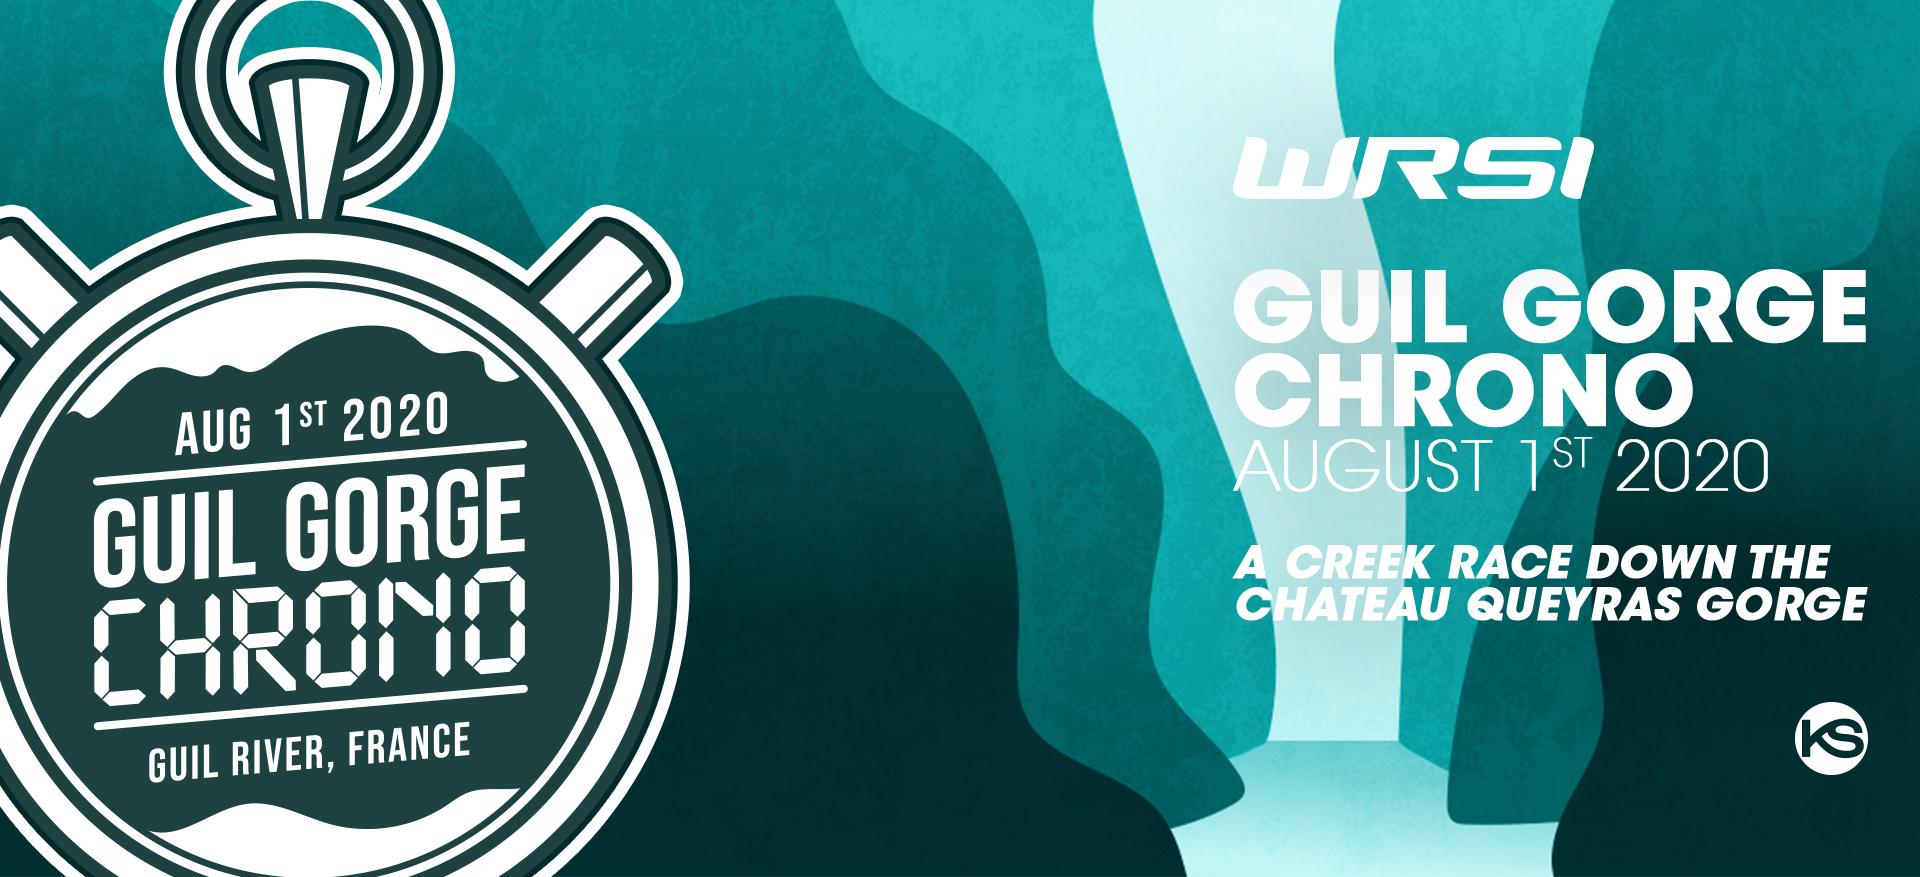 Guil Gorge Chrono 2020 English